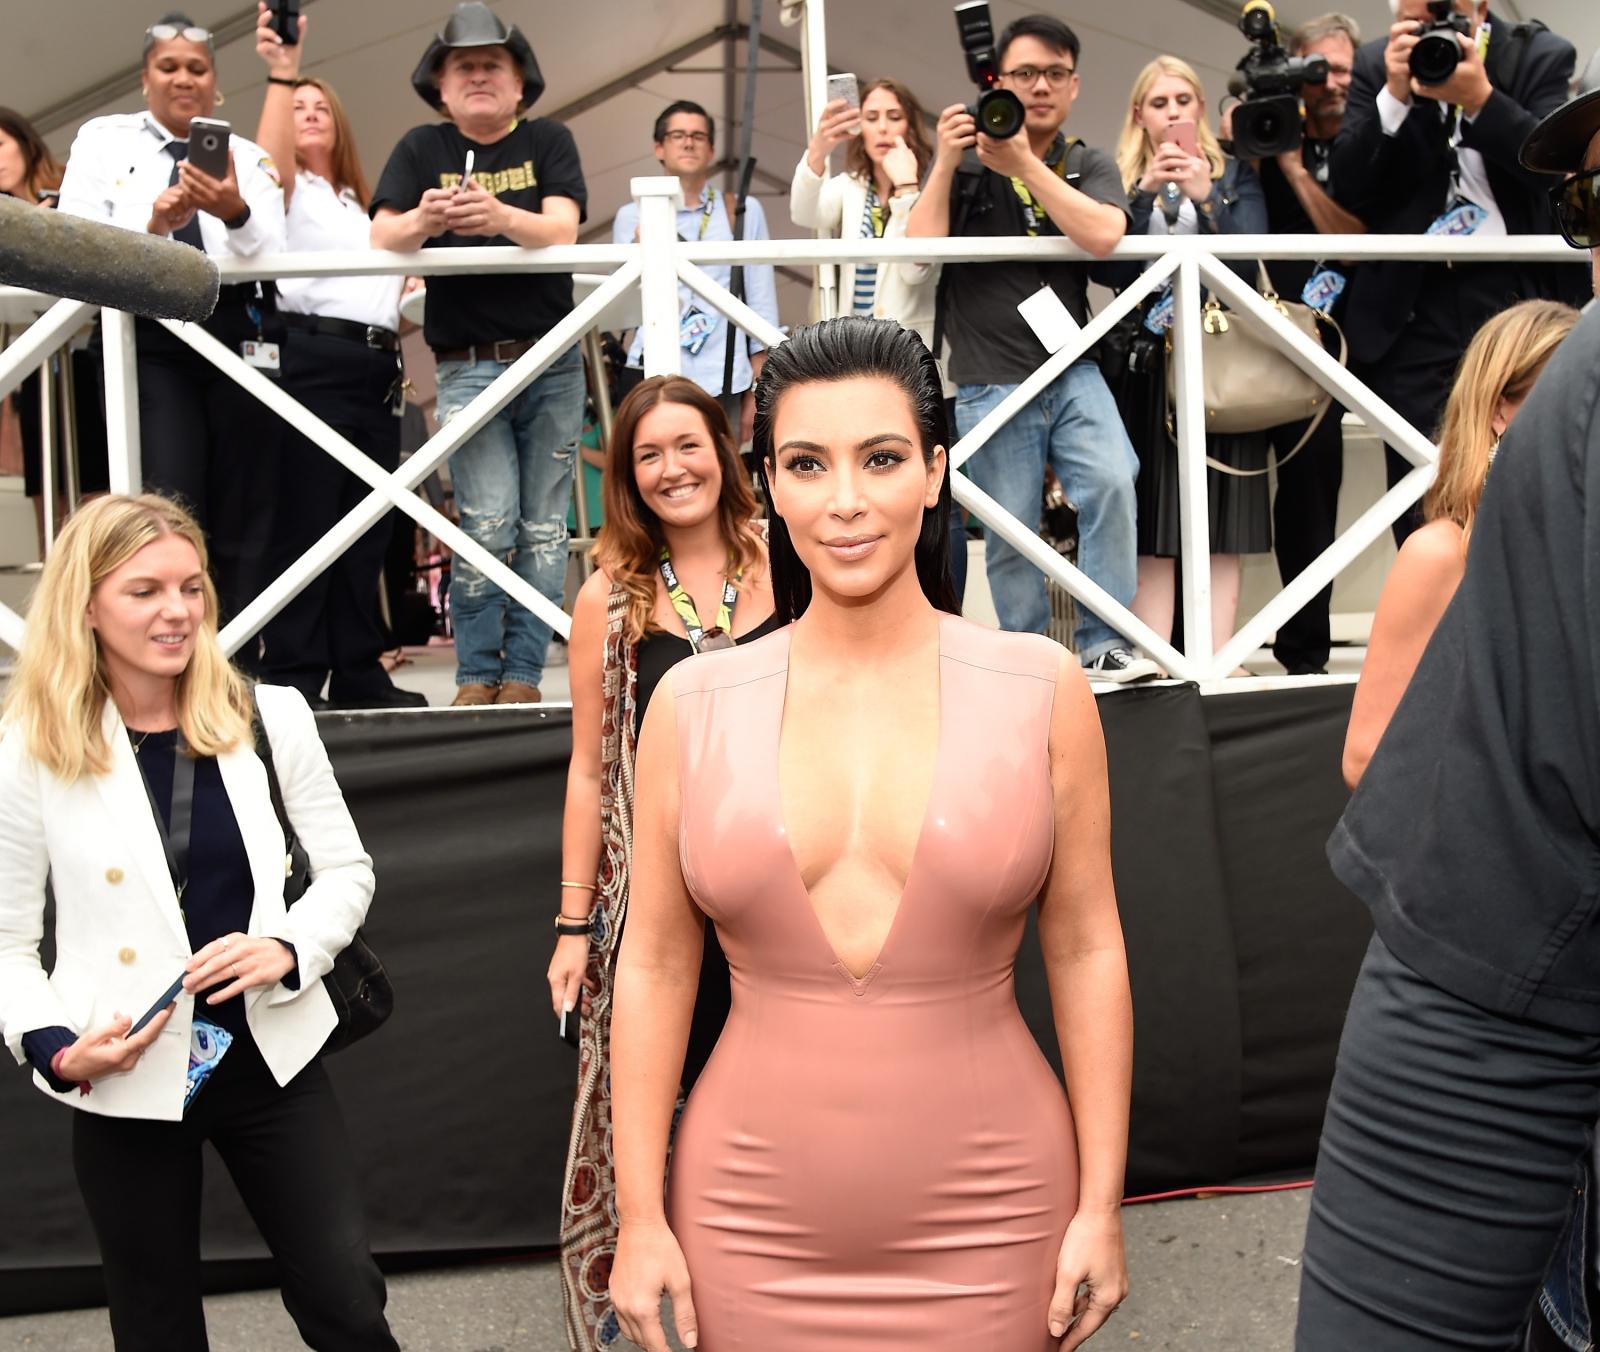 Kim turnbull butt naked (49 pics)